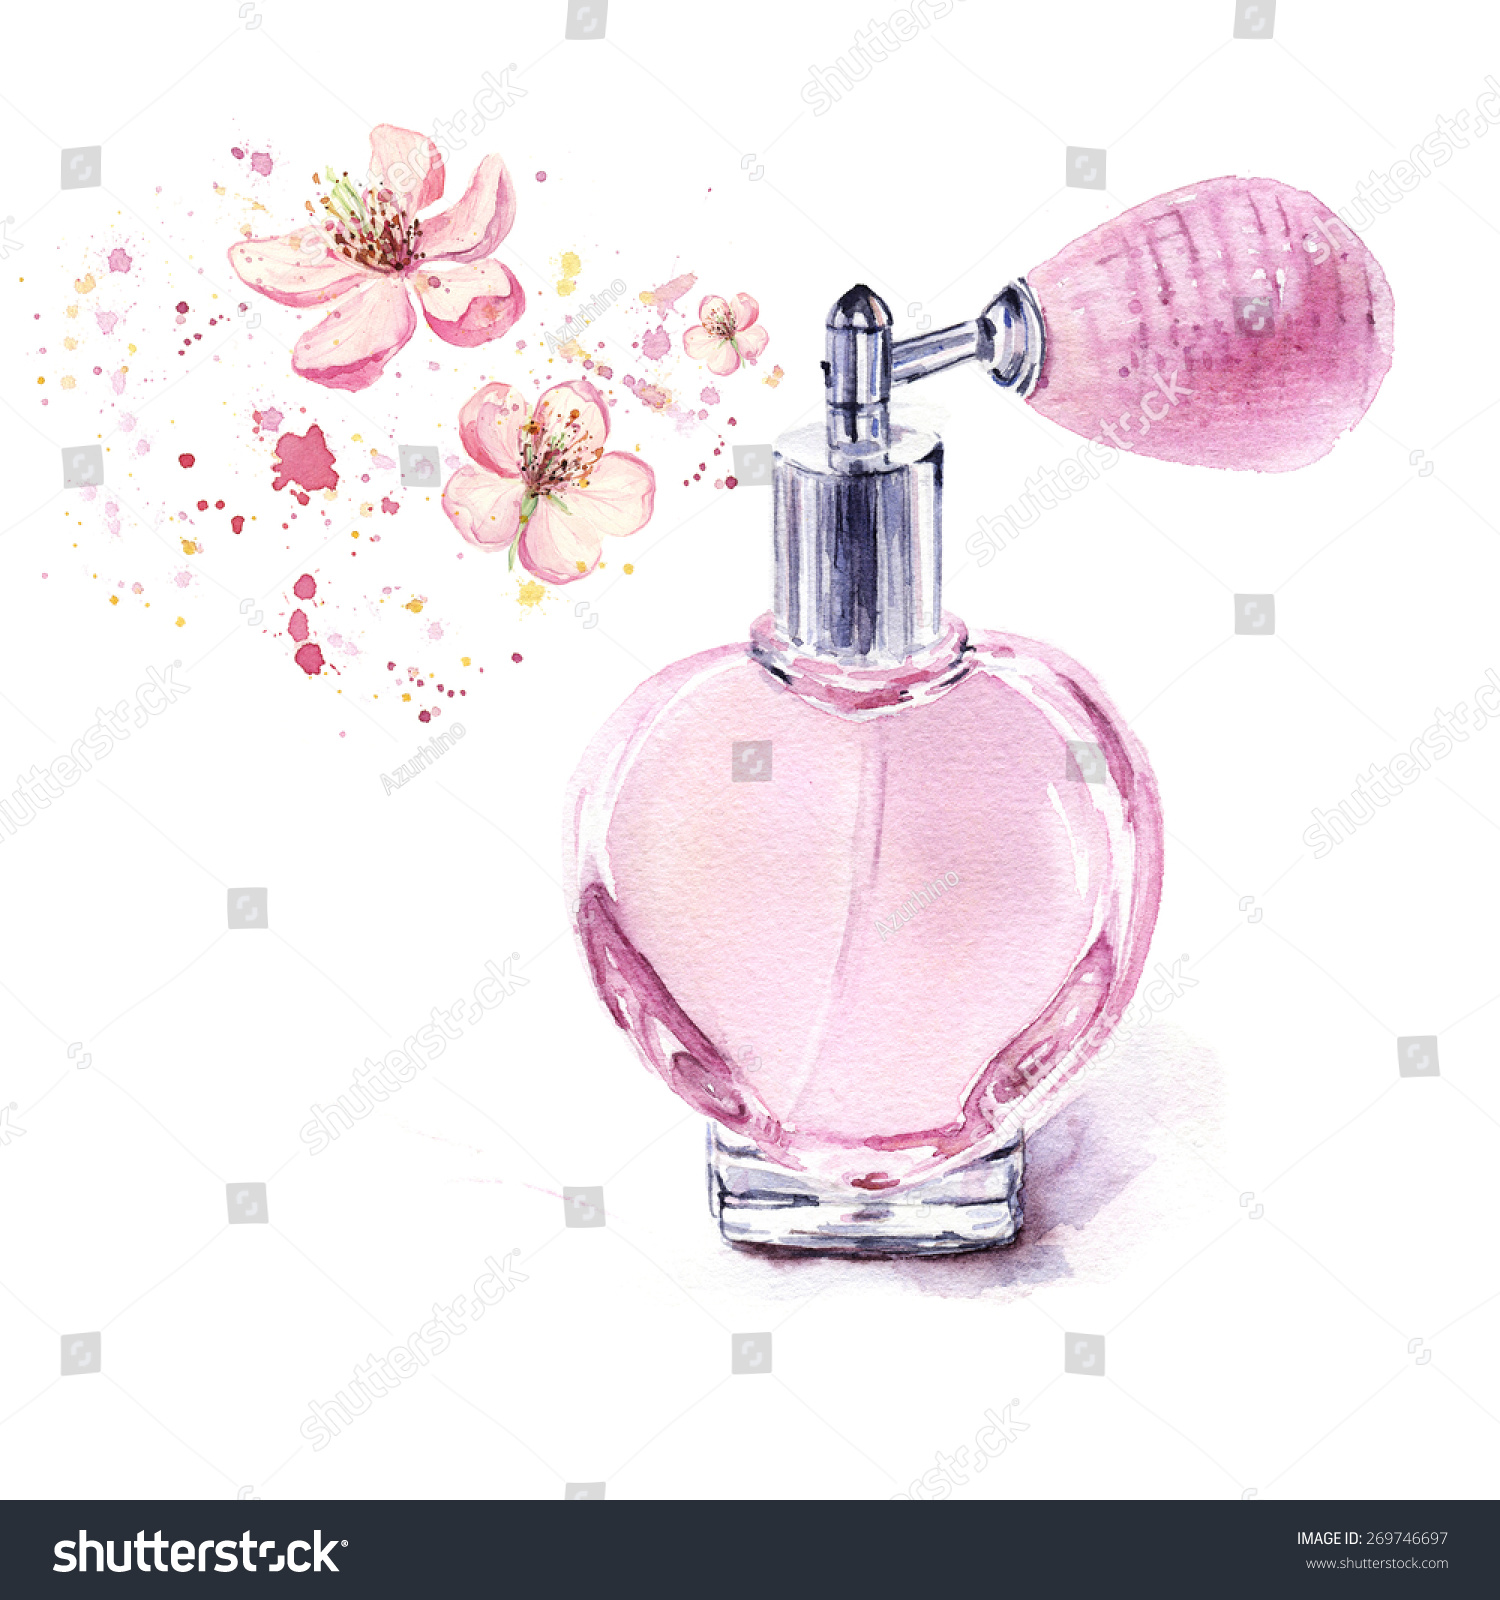 Luxury Style Floral Perfume Logo:  Perfume Bottle Spraying Flowers Isolated On Stock